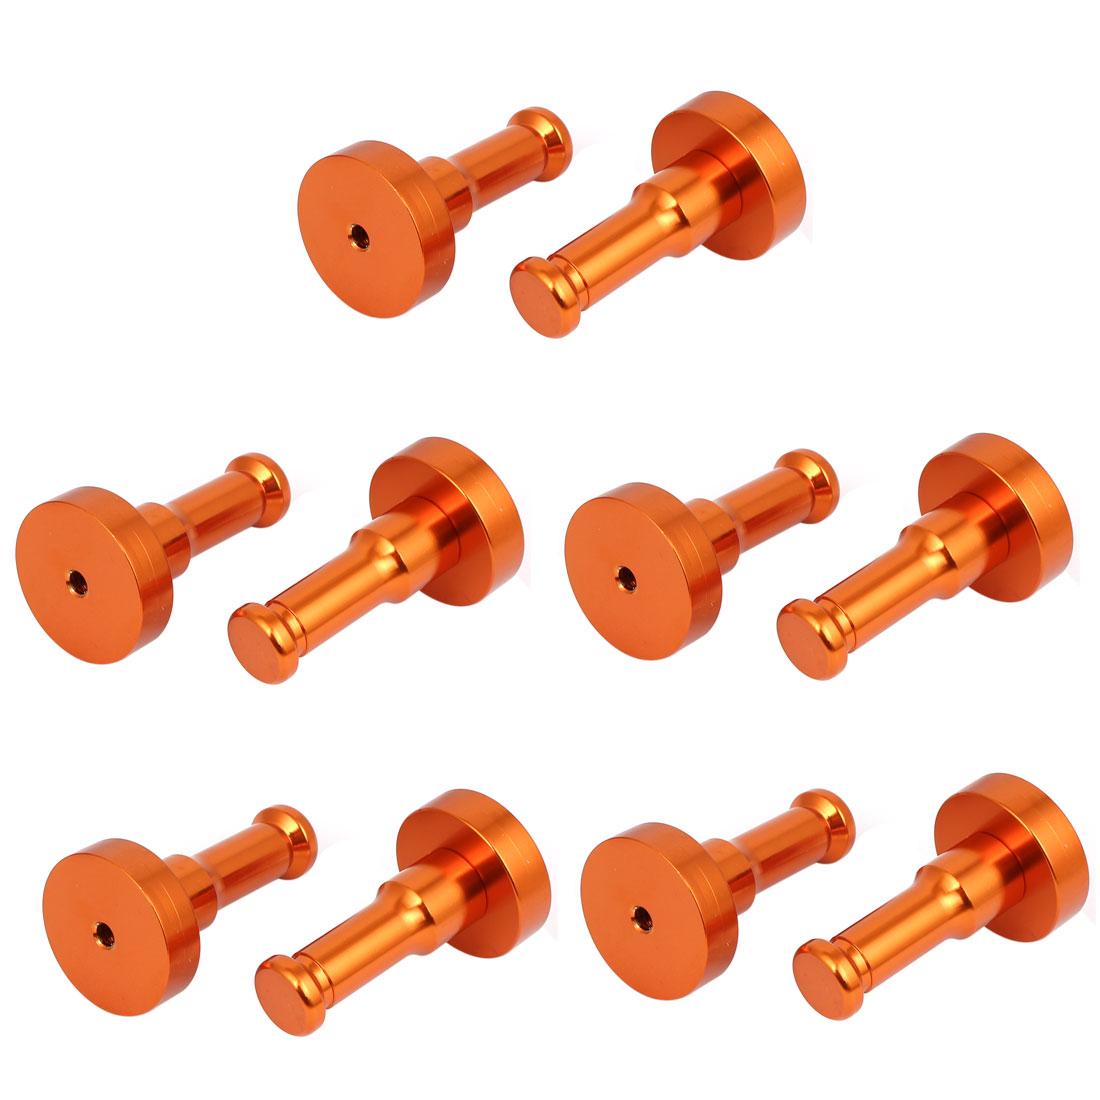 Bathroom Decorative Aluminium Hanger Clothes Holder Round Robe Hook Orange 10pcs